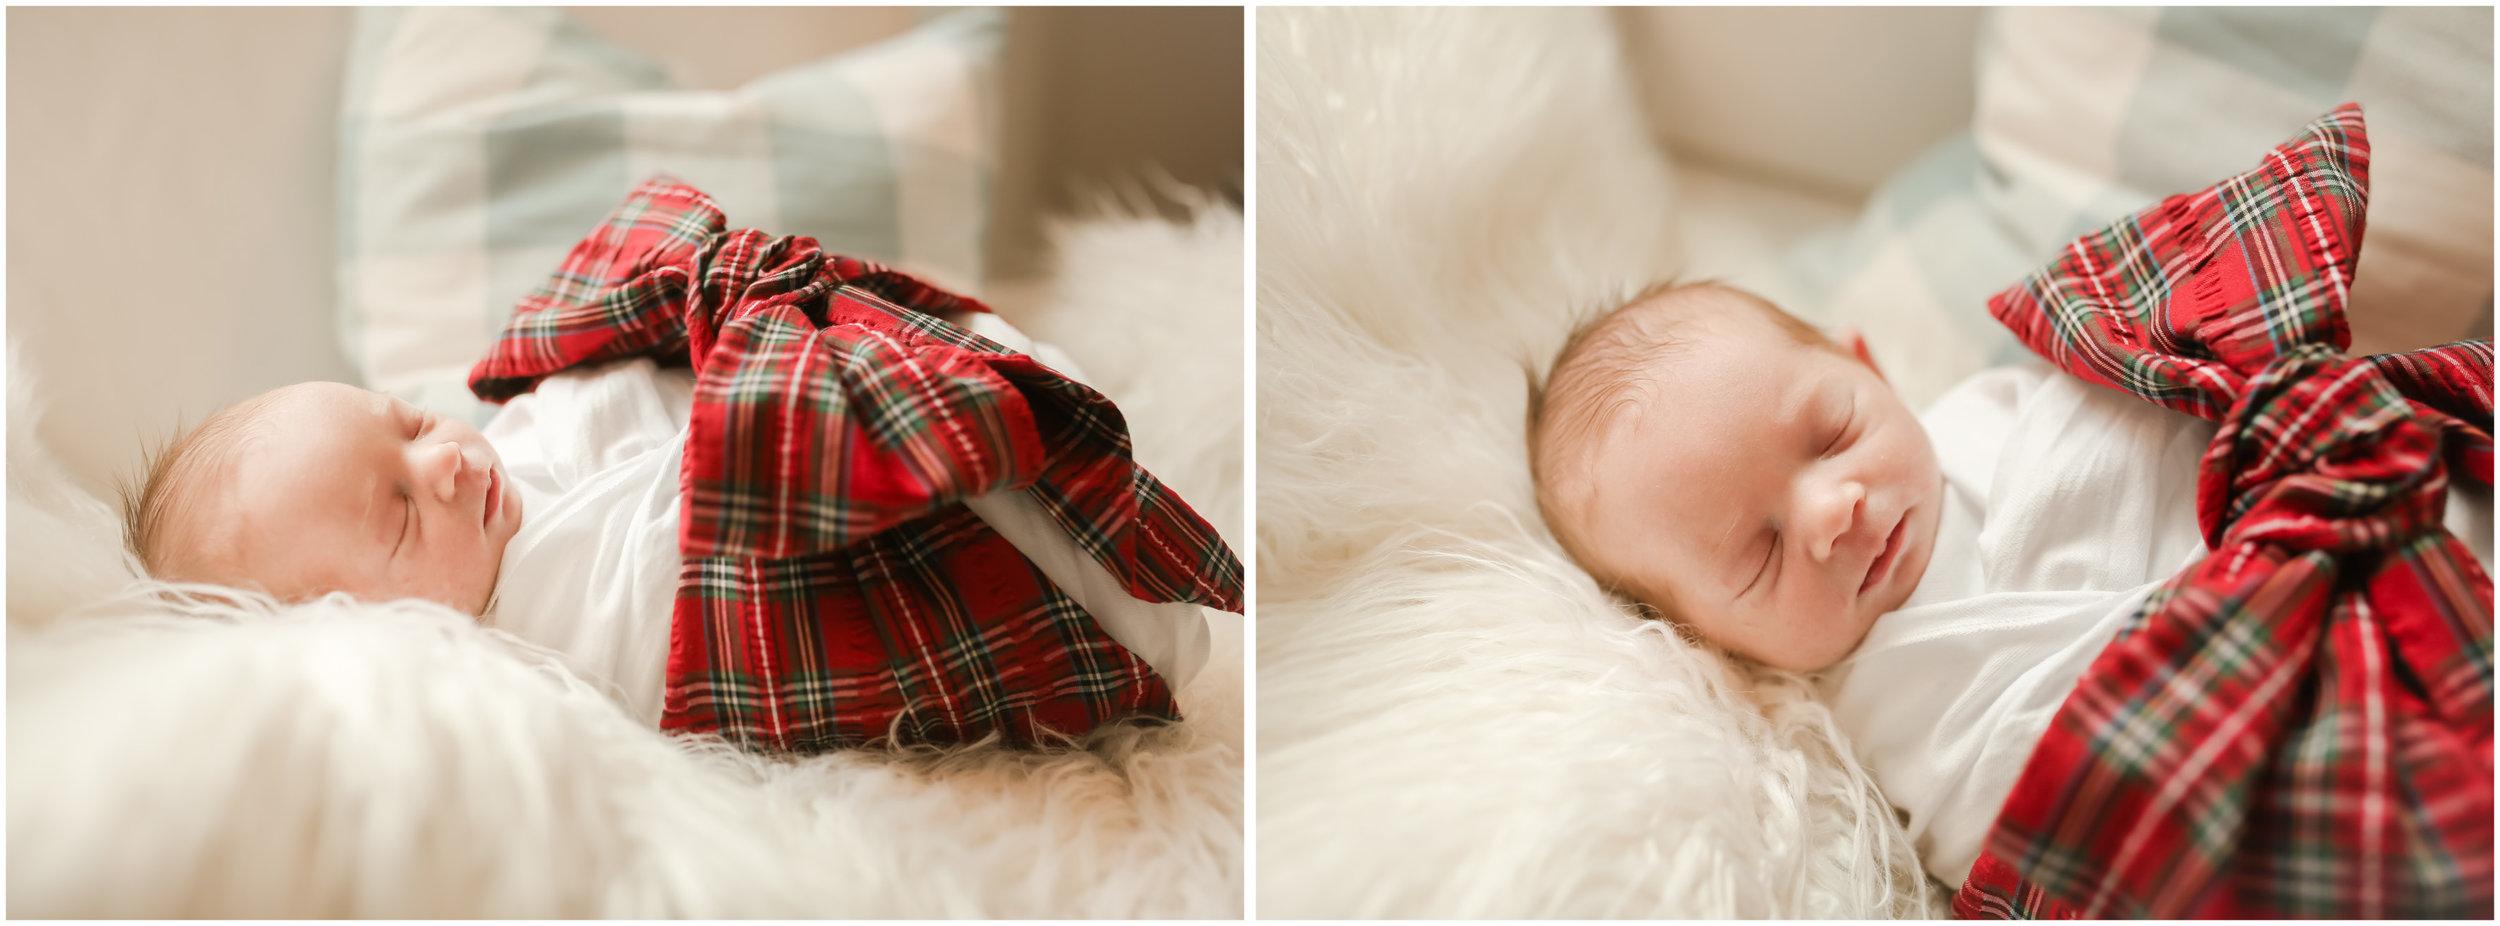 jenny grimm photography santa baby christmas bow newborn lifestyle photography chicago